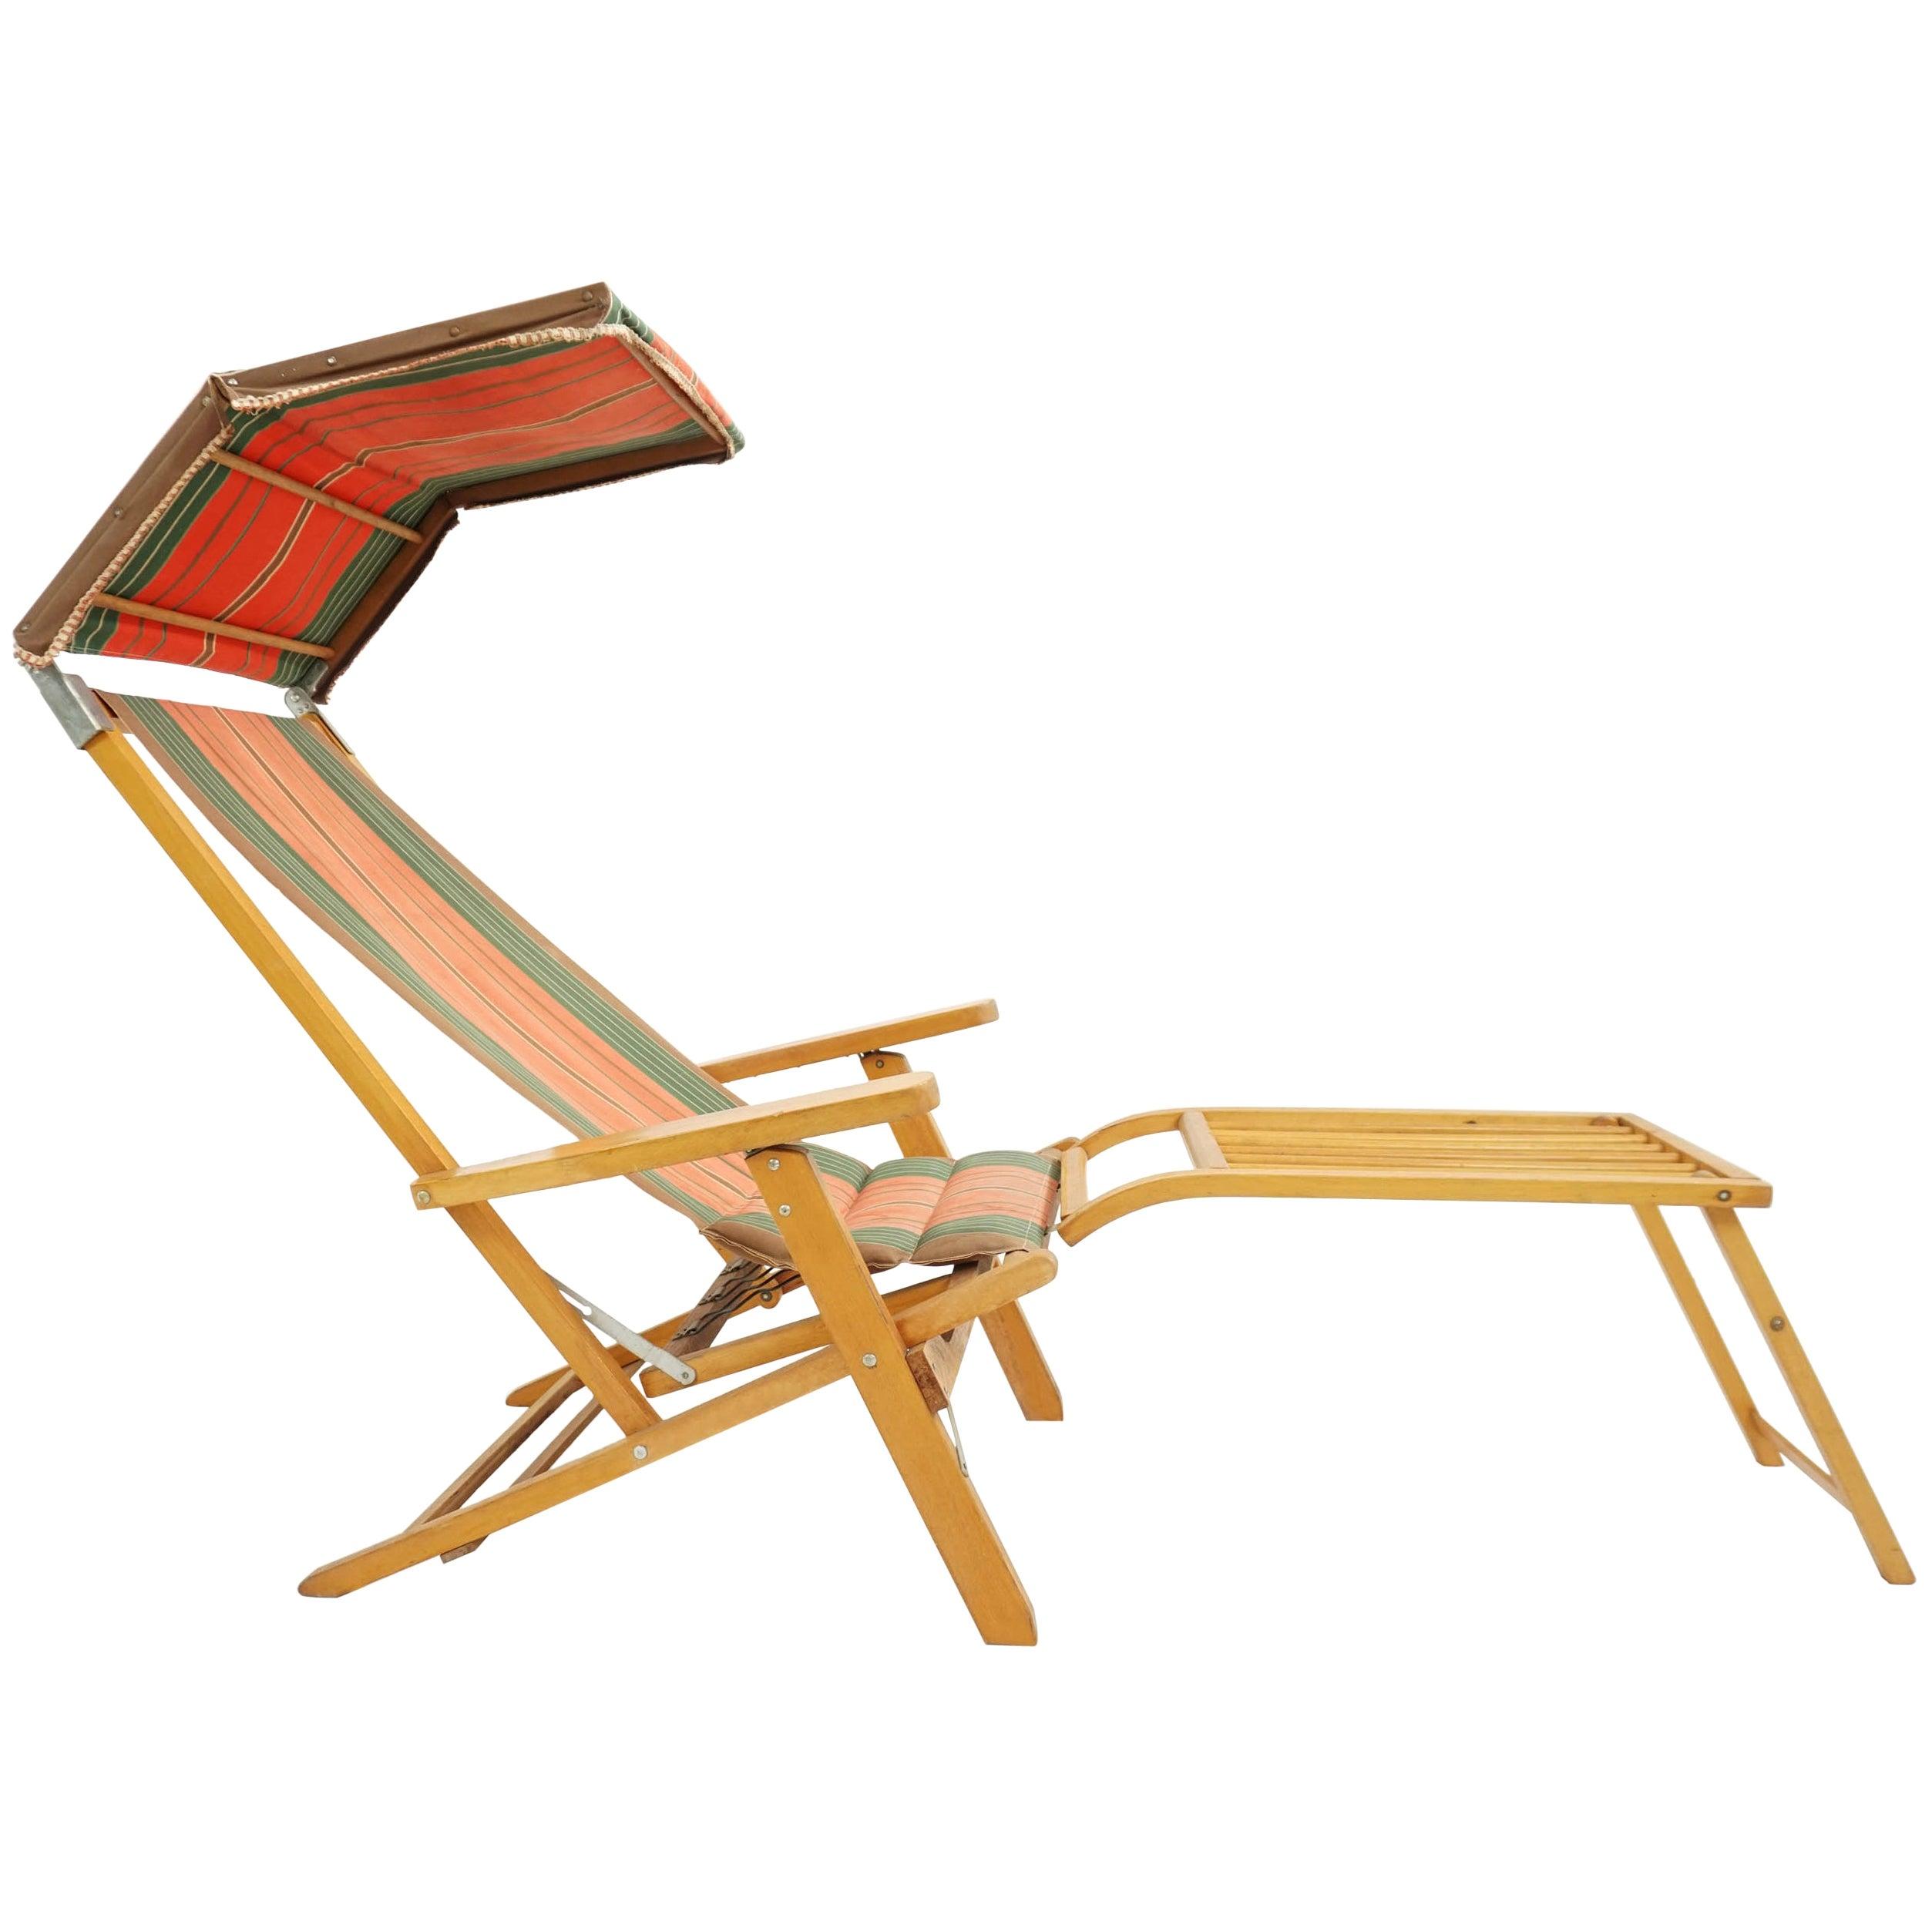 Scandinavia Traveling Outdoor Lounge Chair, Sweden 1950 Luchs